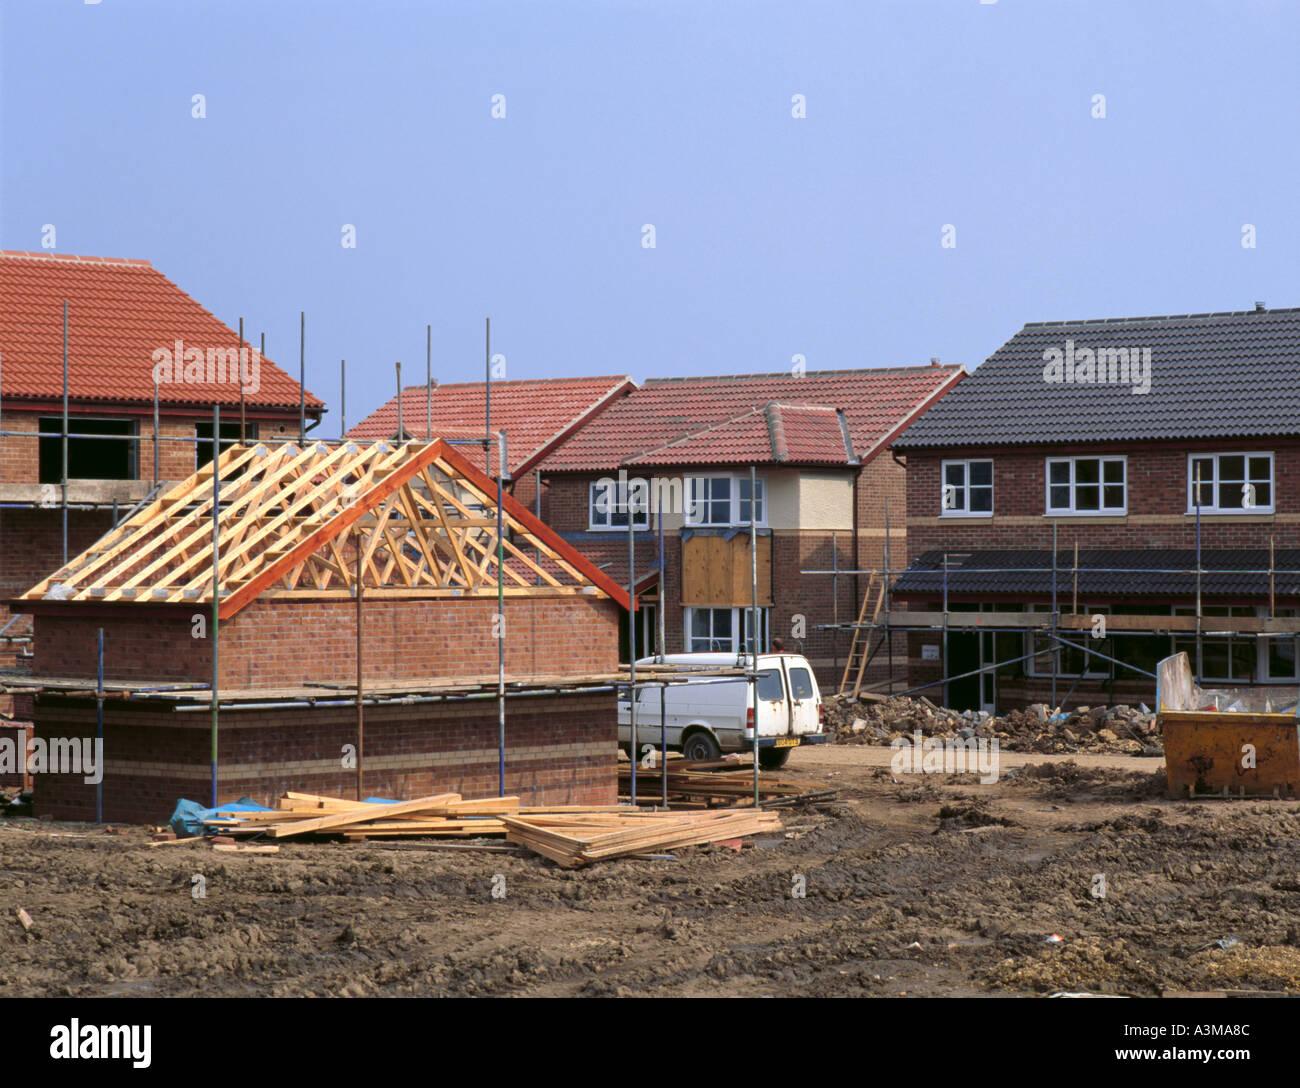 timber roof truss stockfotos timber roof truss bilder. Black Bedroom Furniture Sets. Home Design Ideas